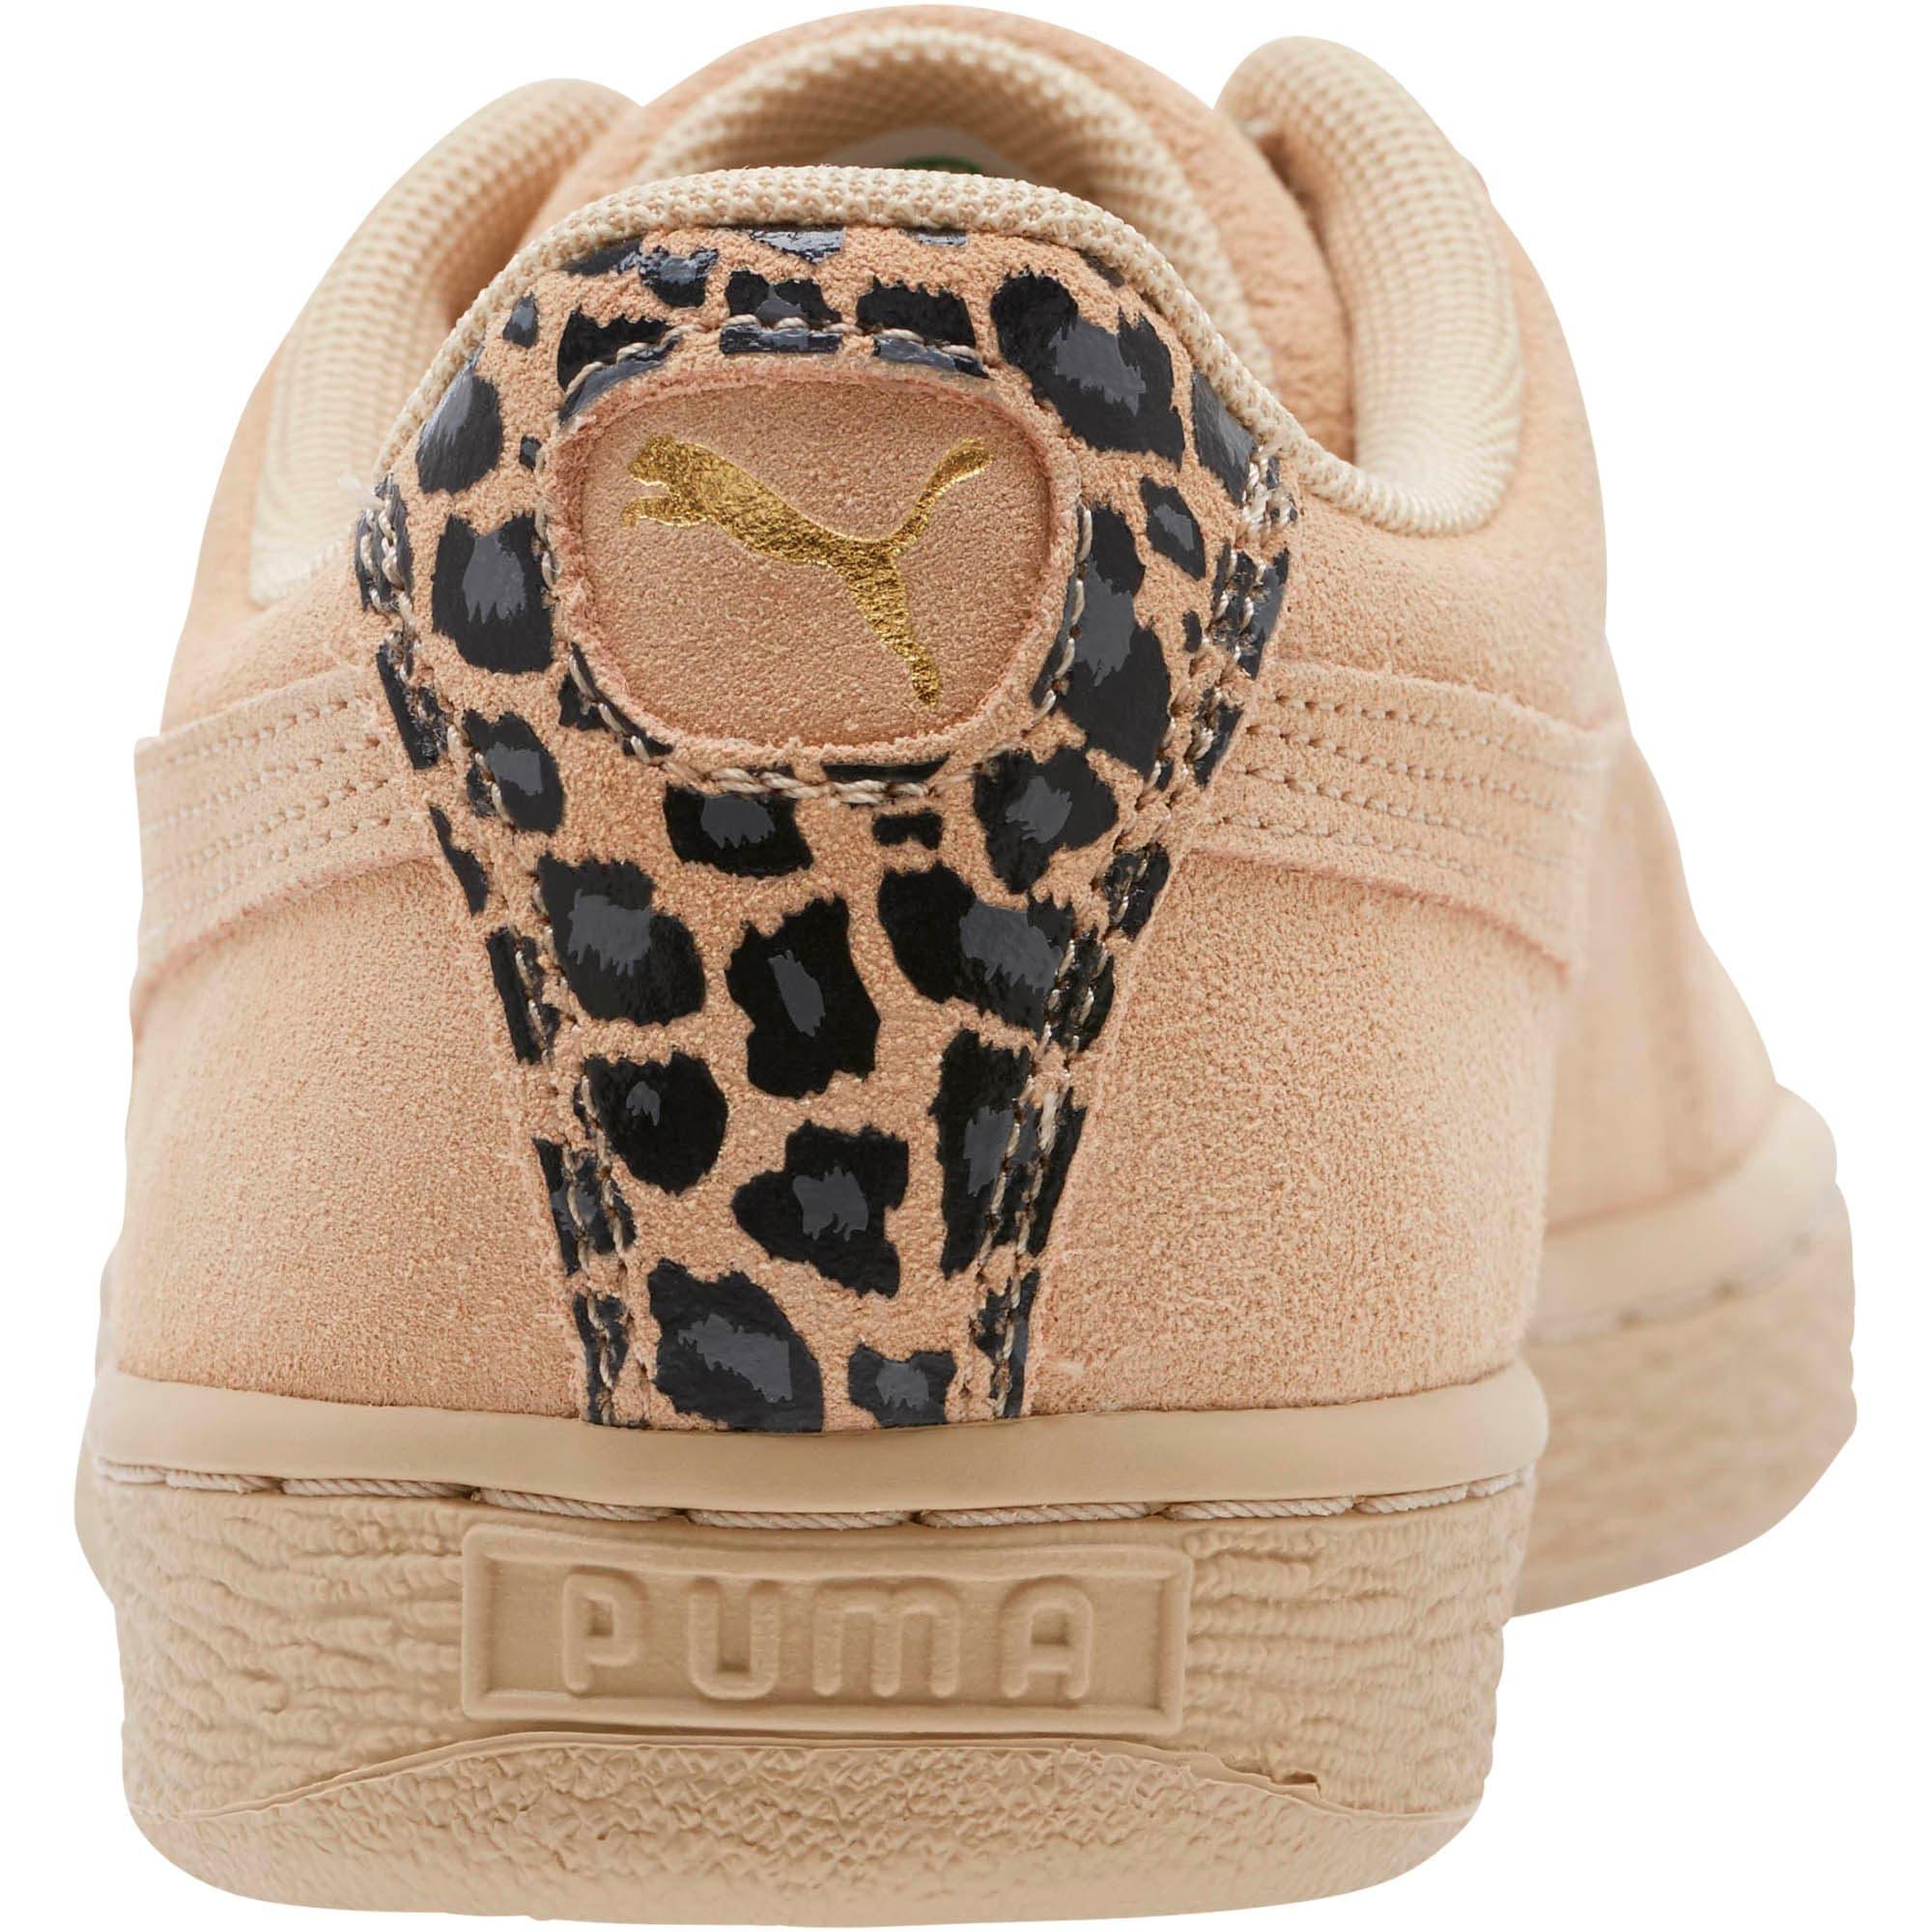 Thumbnail 4 of Suede Wild Women's Sneakers, Pebble- Gold-Puma Black, medium